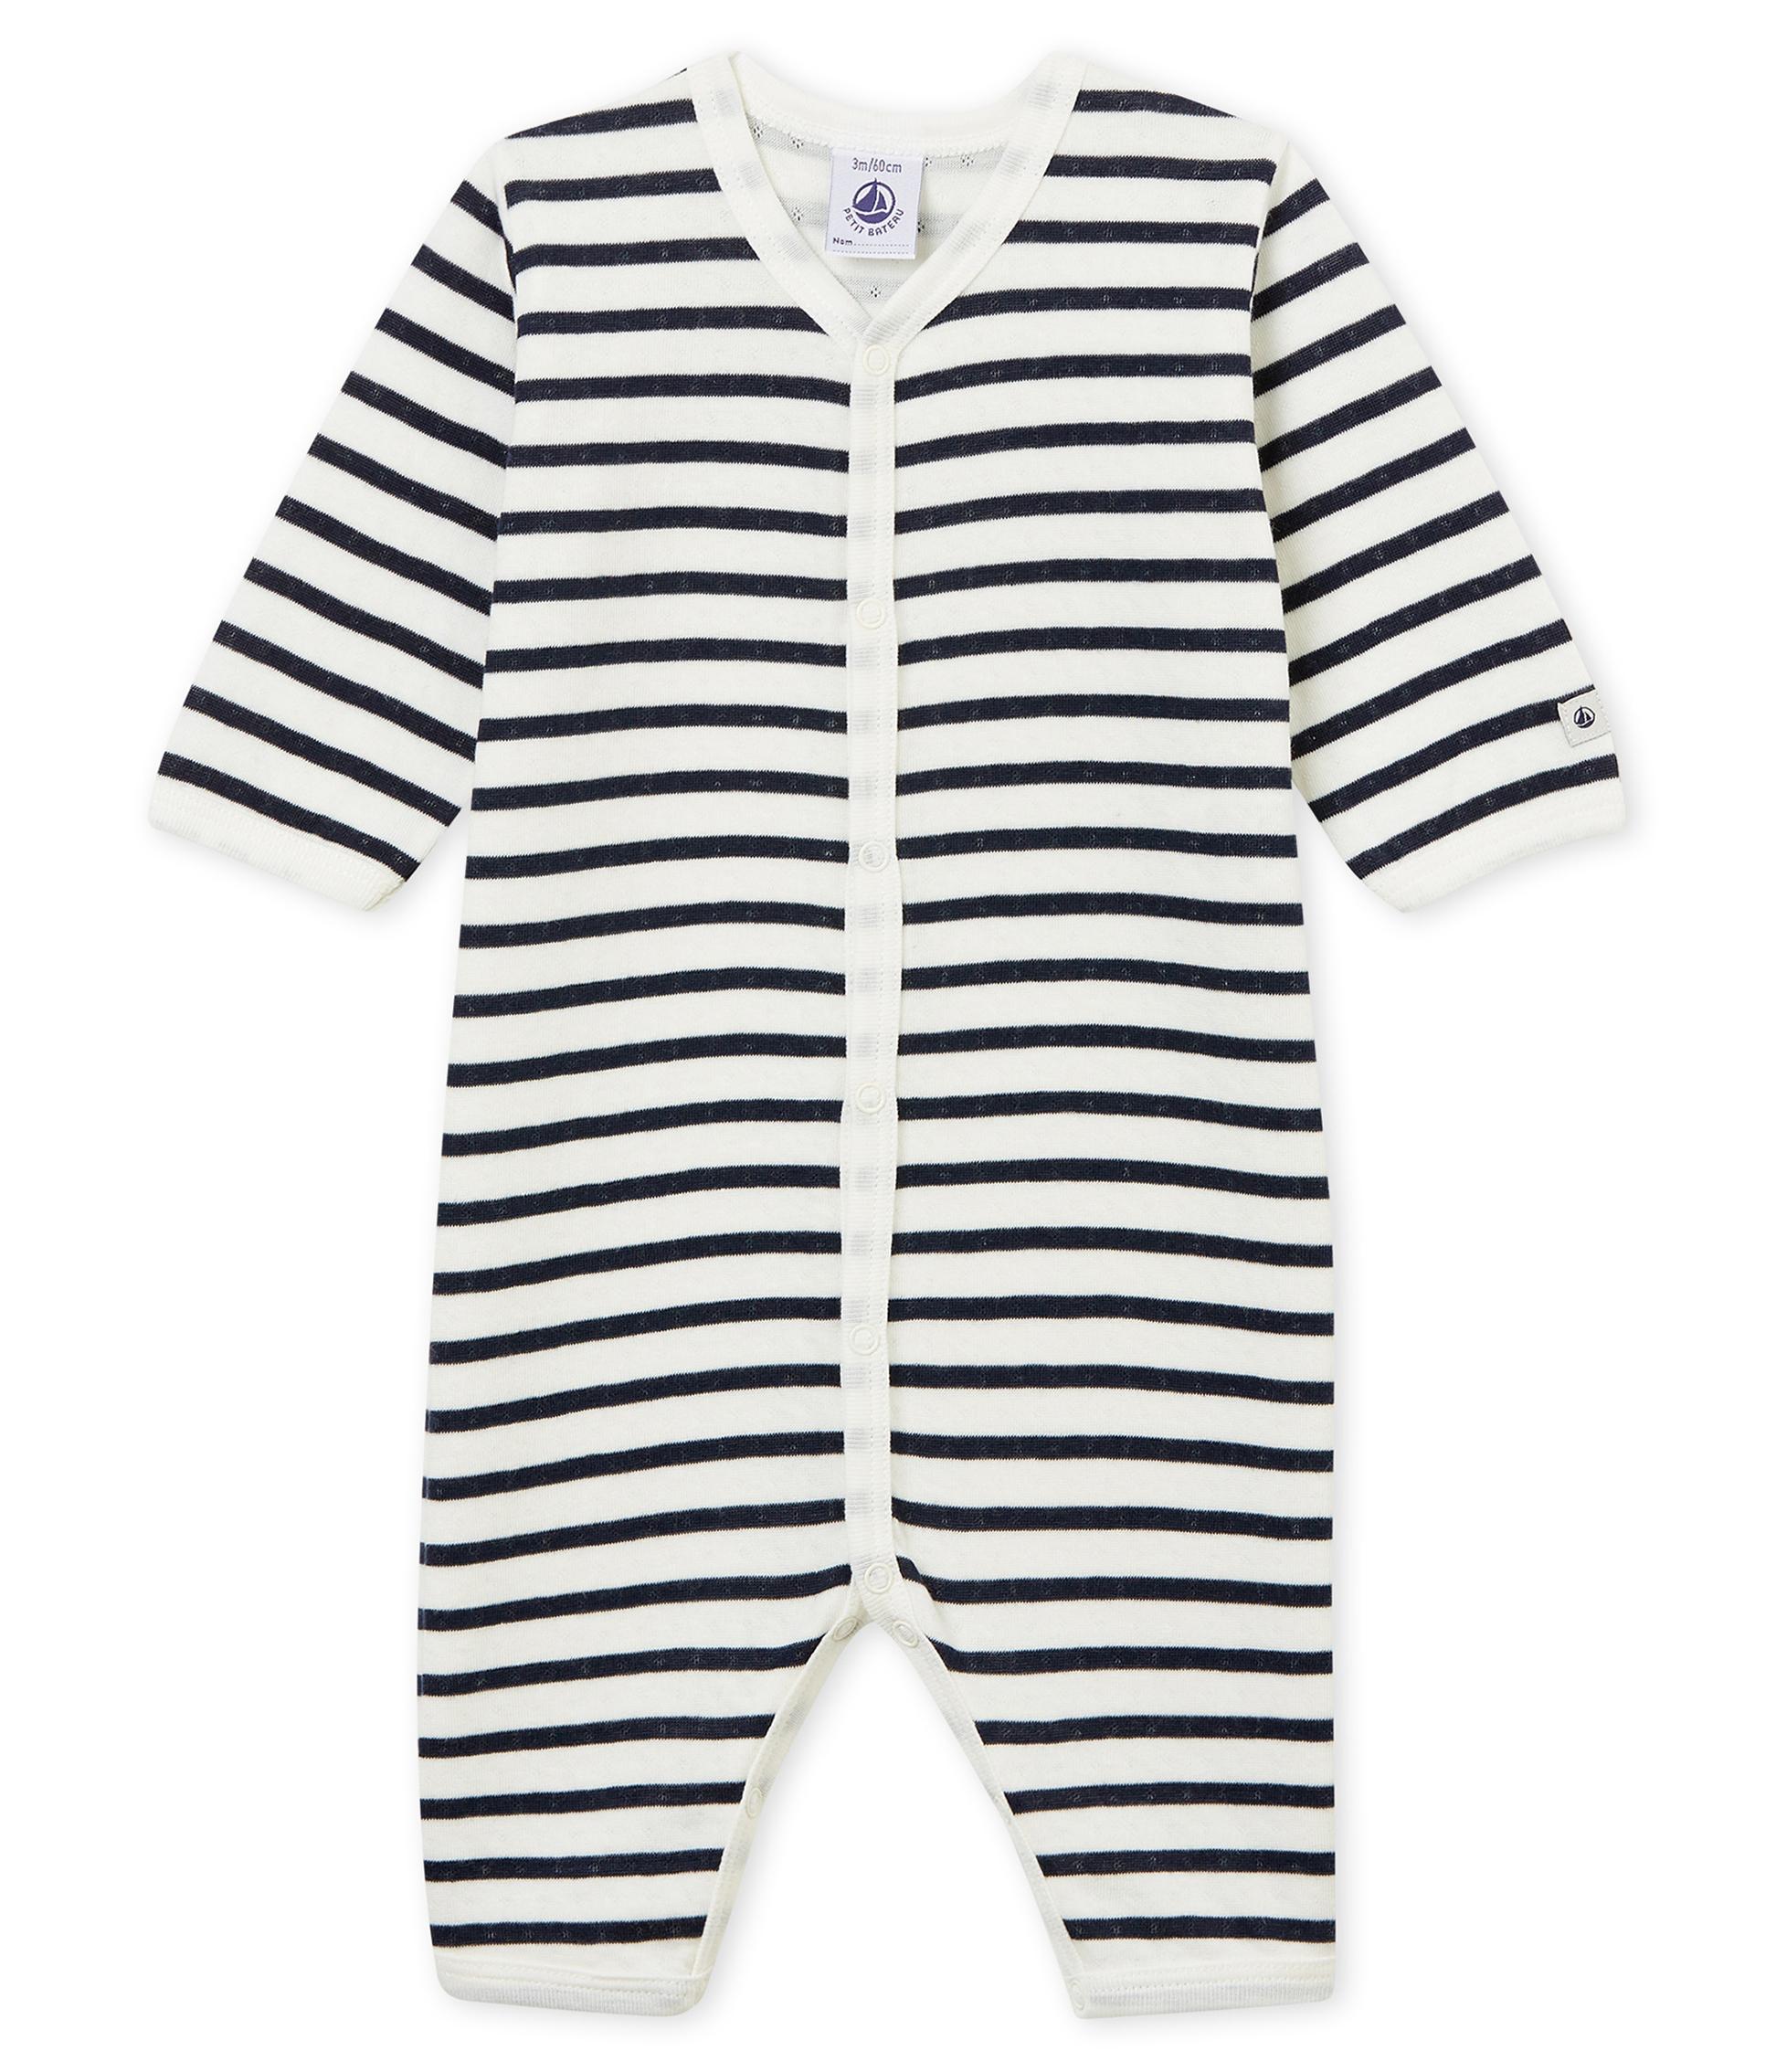 dd3cfc006 Pijama unisex de bebé sin pies en túbico | Petit Bateau